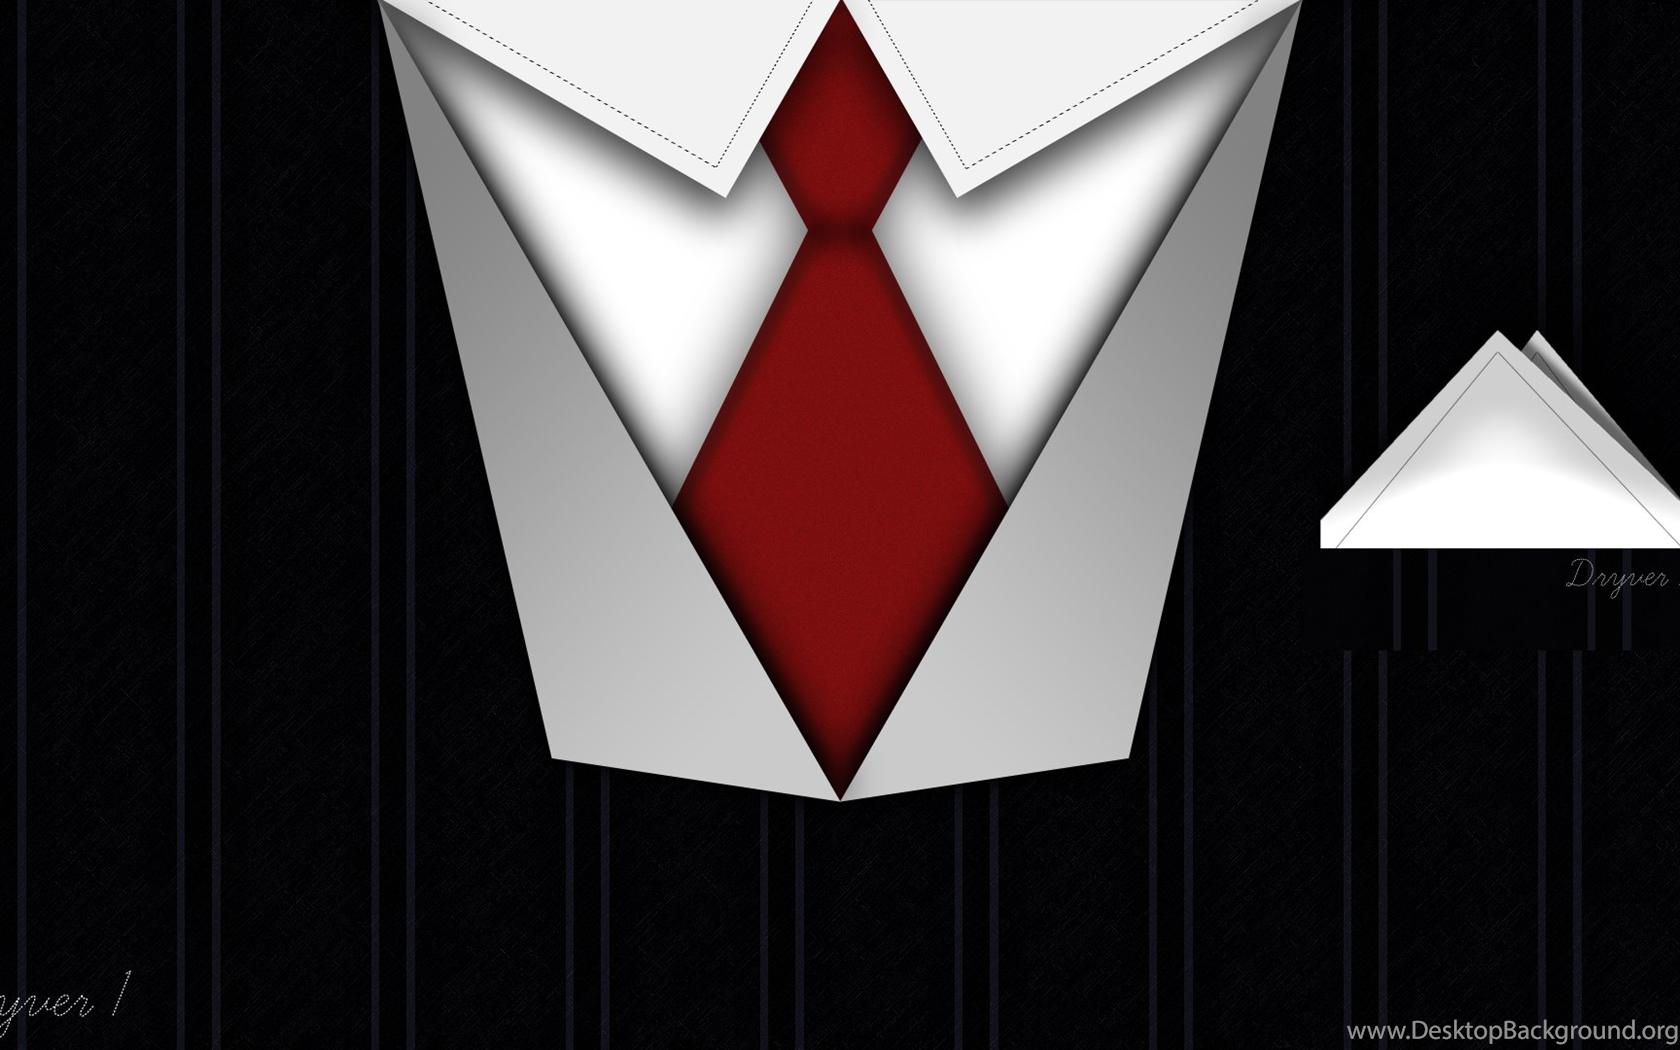 Top Suit And Tie Iphone Wallpaper Images For Pinterest Desktop